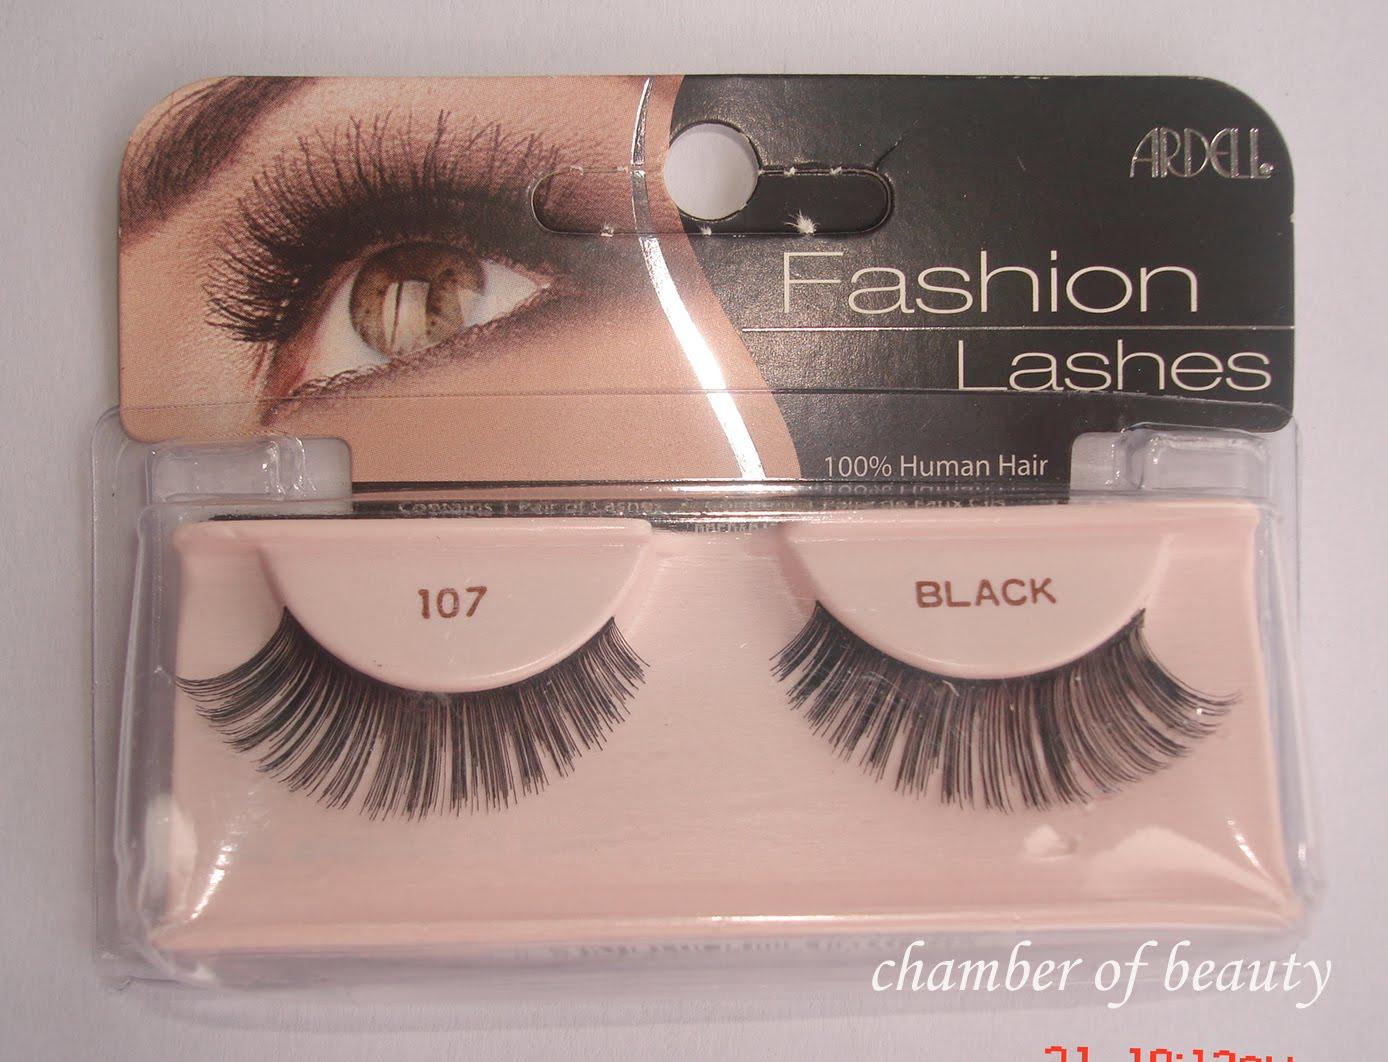 6a231379e8c More false eyelashes from KKcenterHK & a summery eye makeup ...